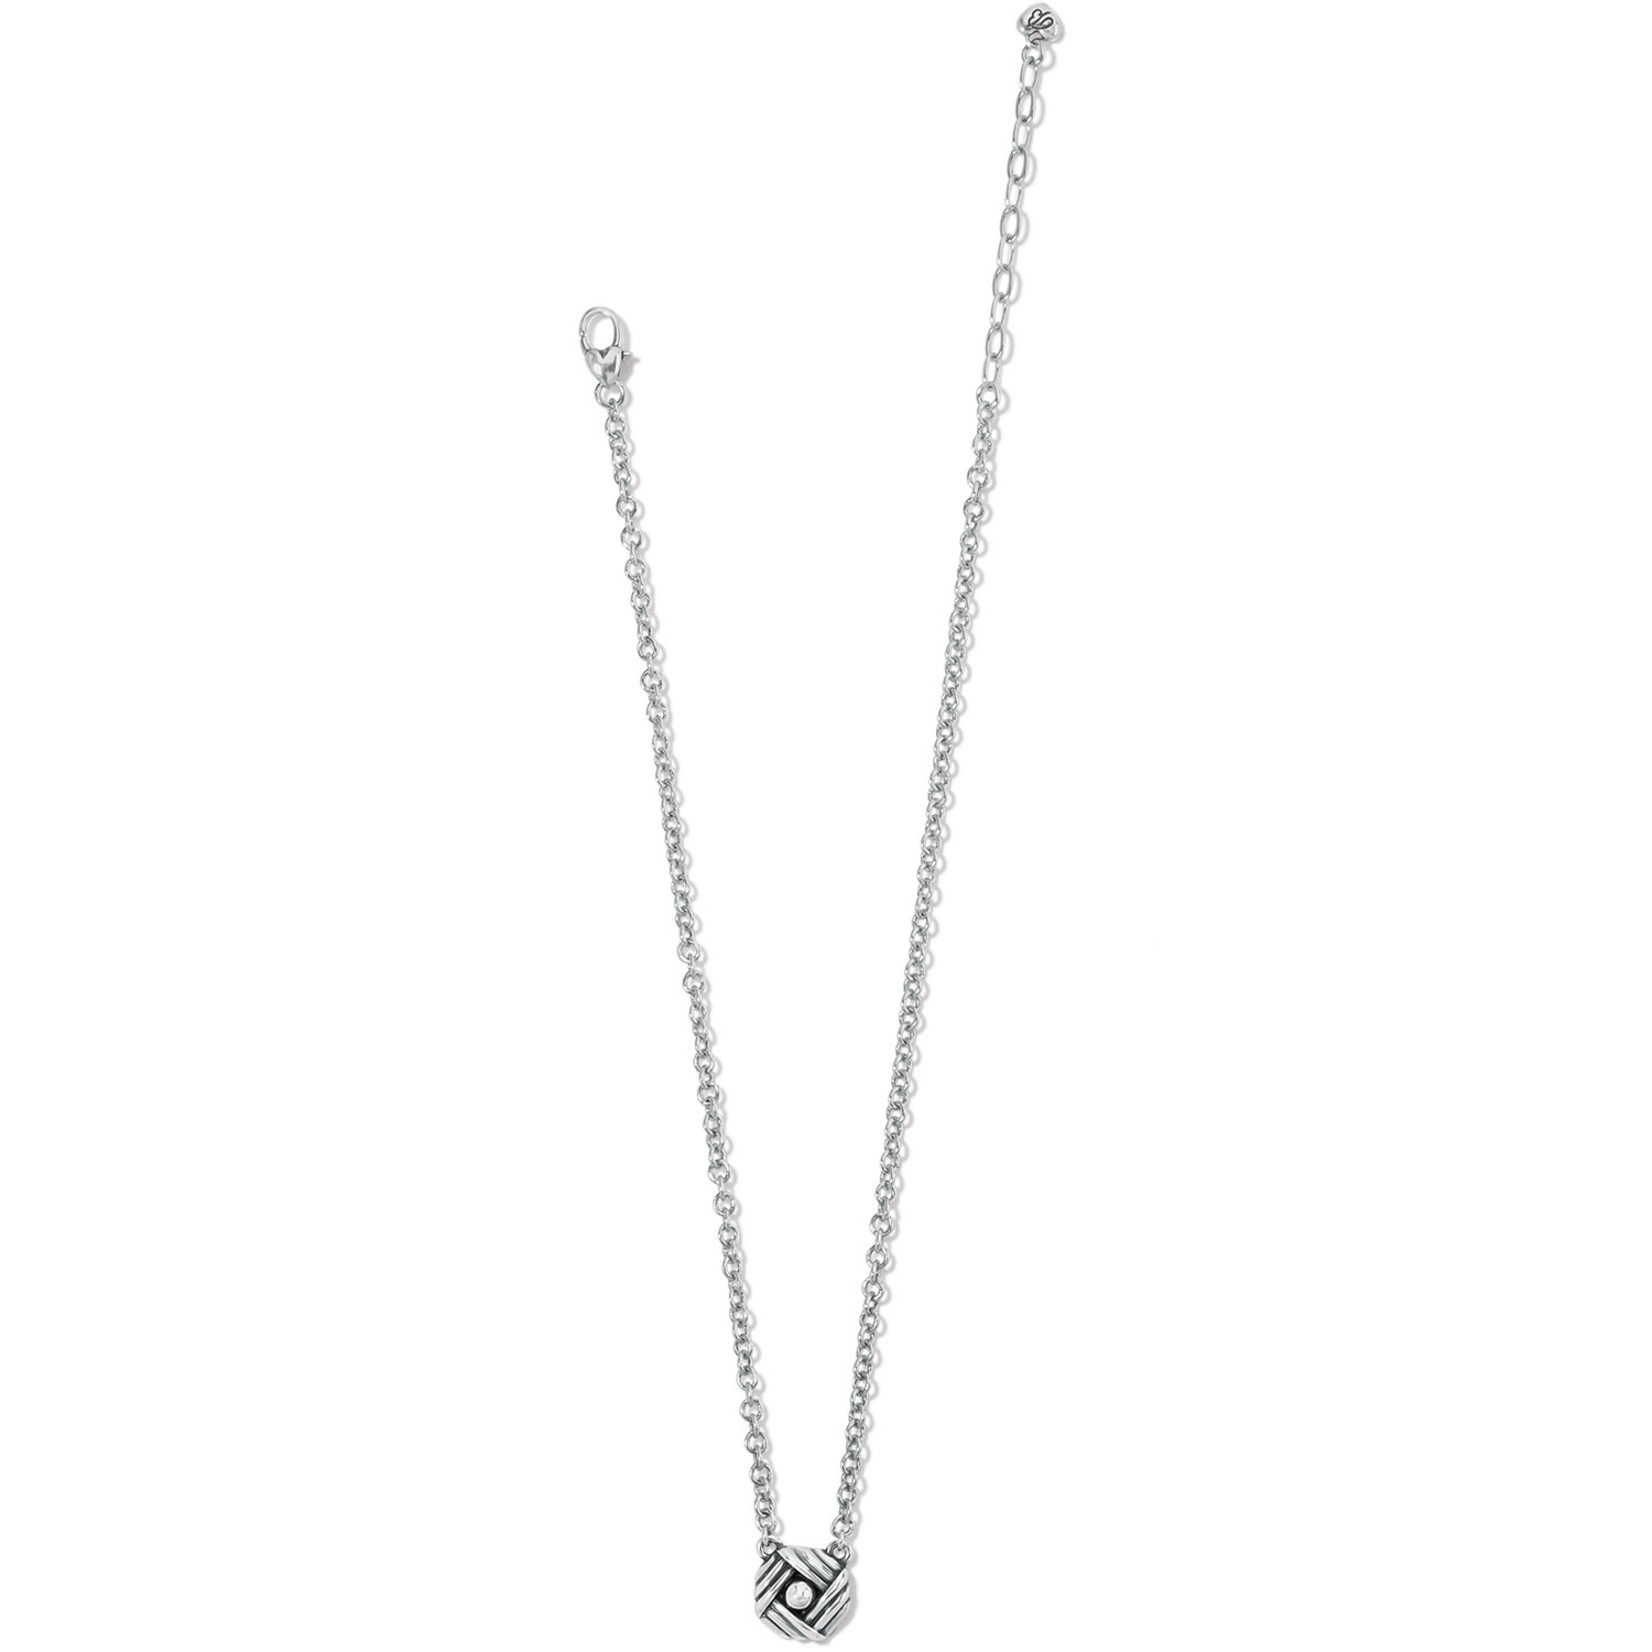 Brighton Sonora Knot Necklace - Silver